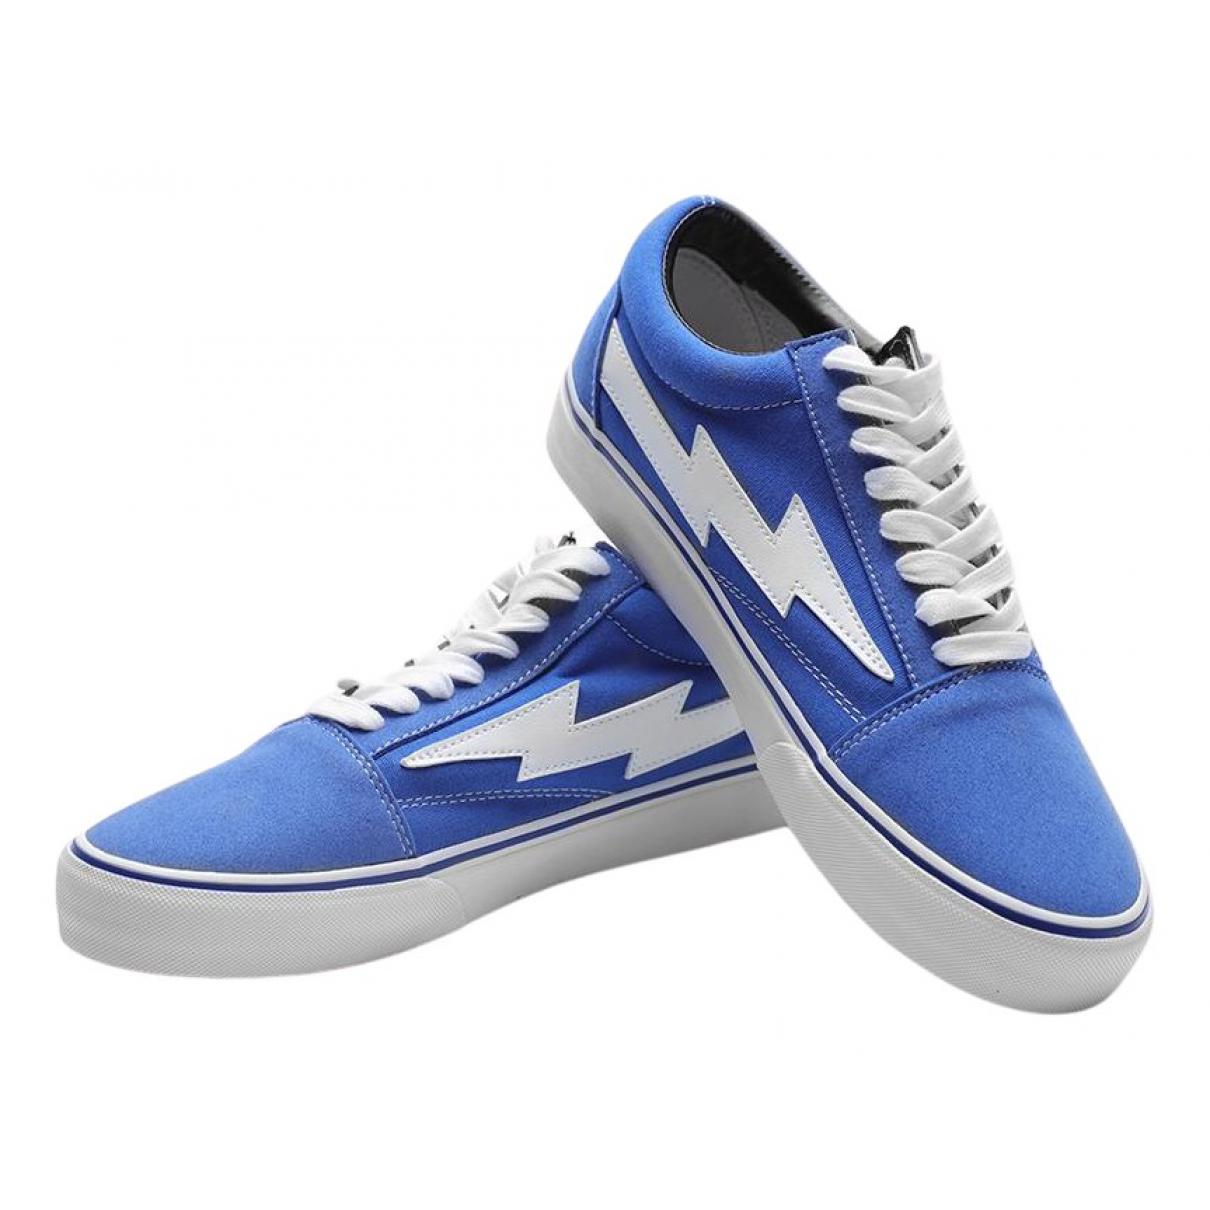 Revenge X Storm \N Sneakers in  Blau Leinen